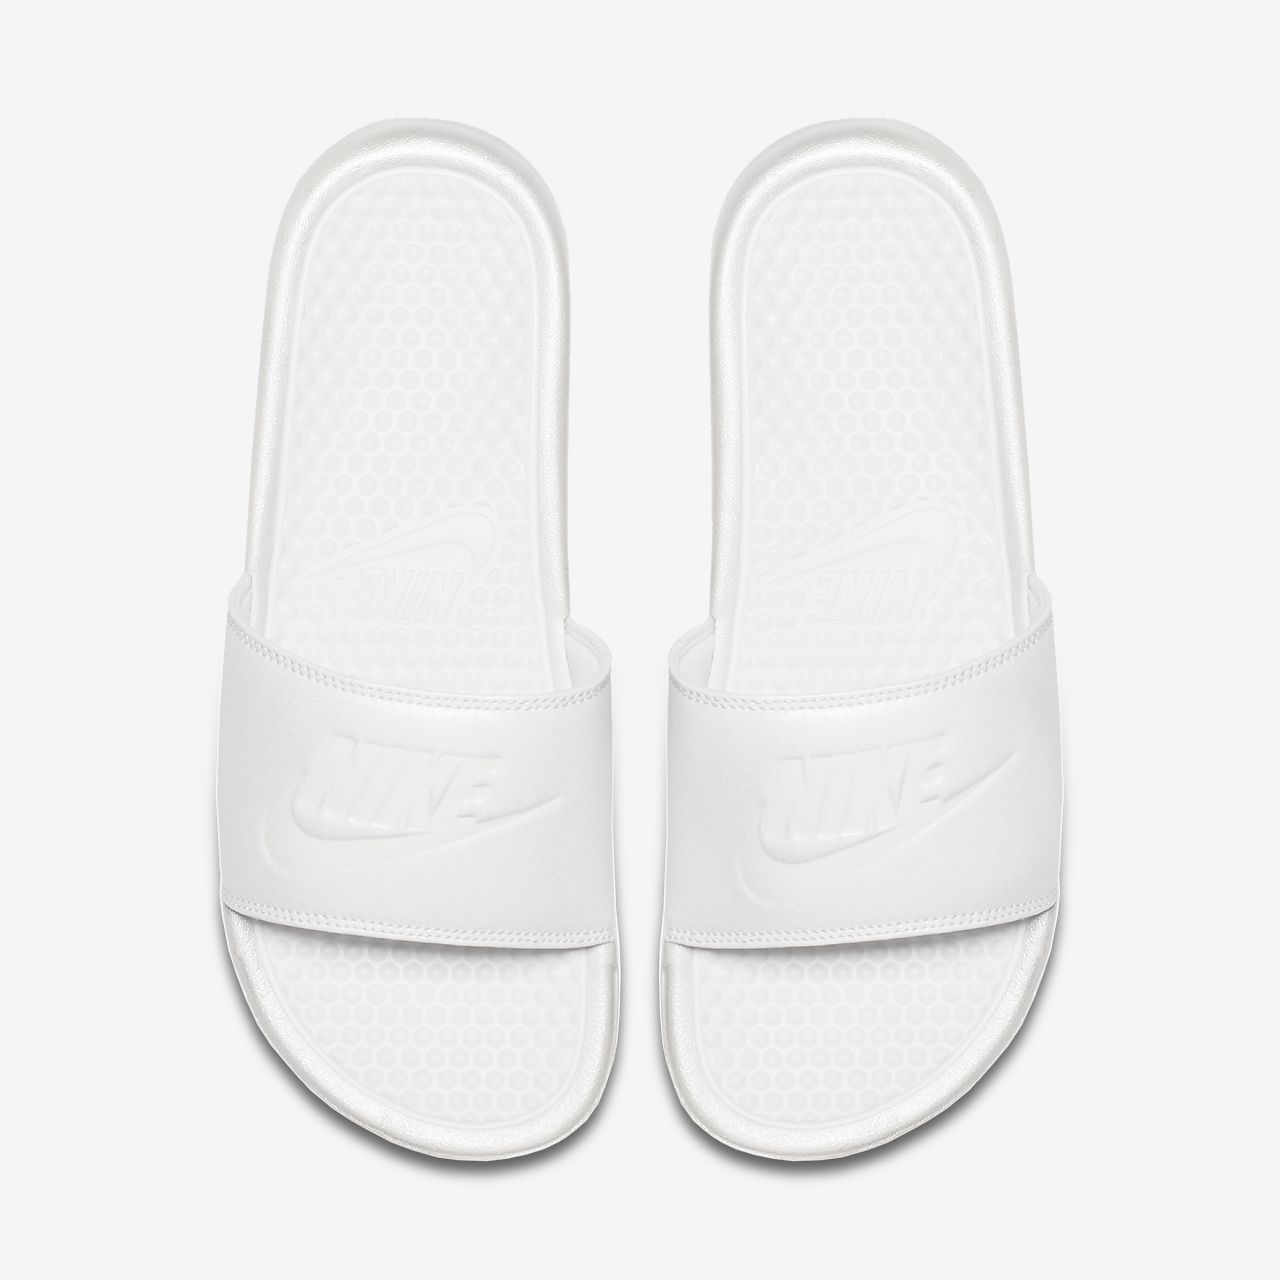 e55ace301 Nike Benassi Metallic QS Women s Slide. Nike.com NL